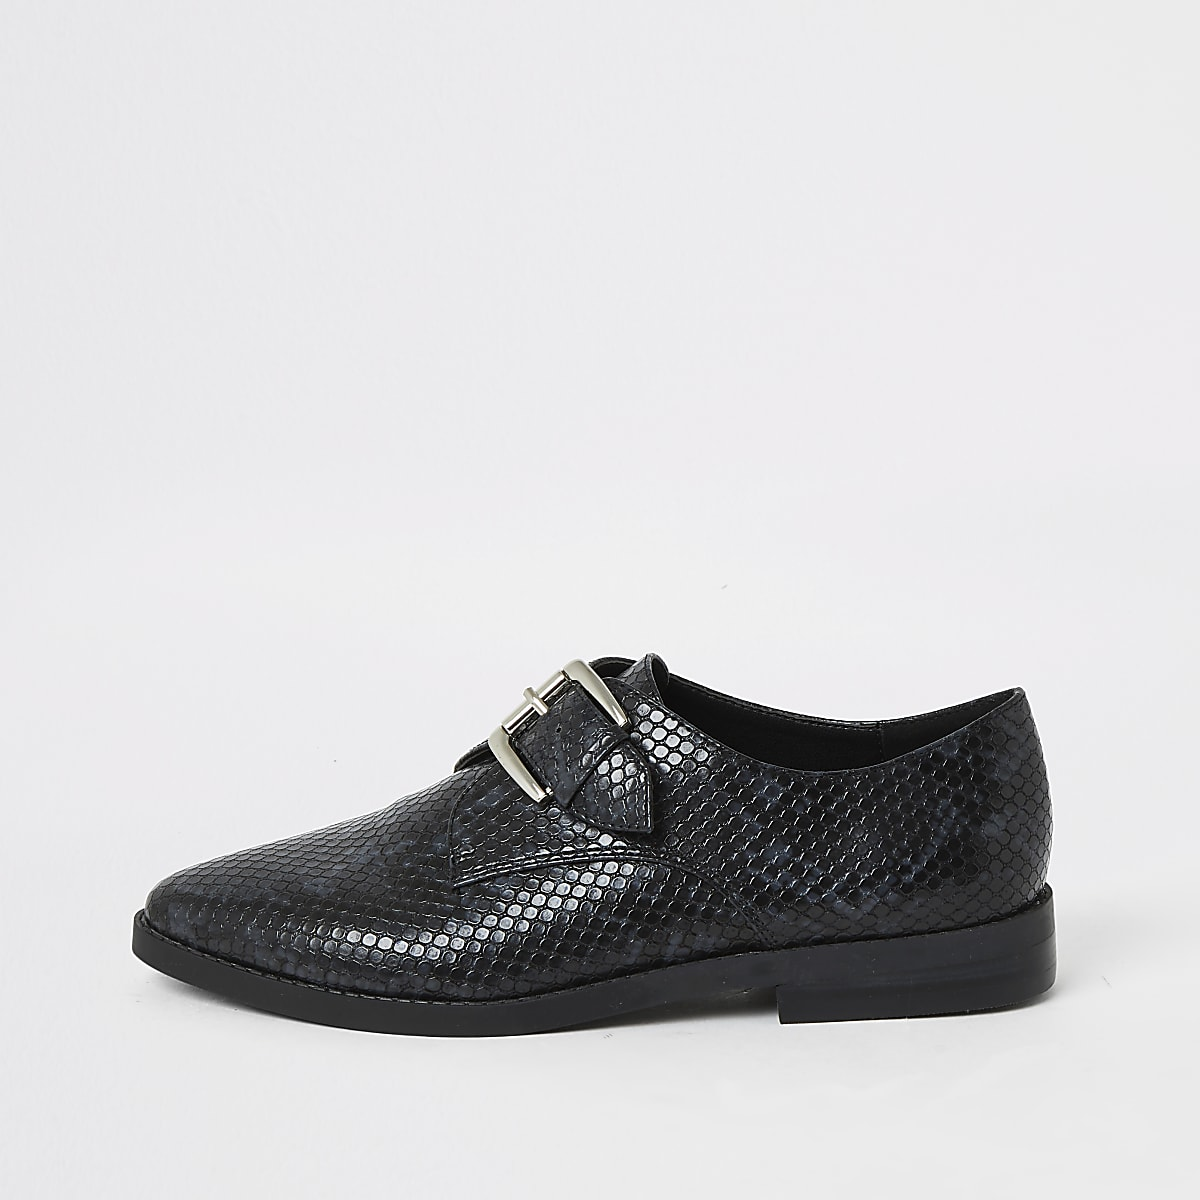 Black embossed monk strap buckle shoe